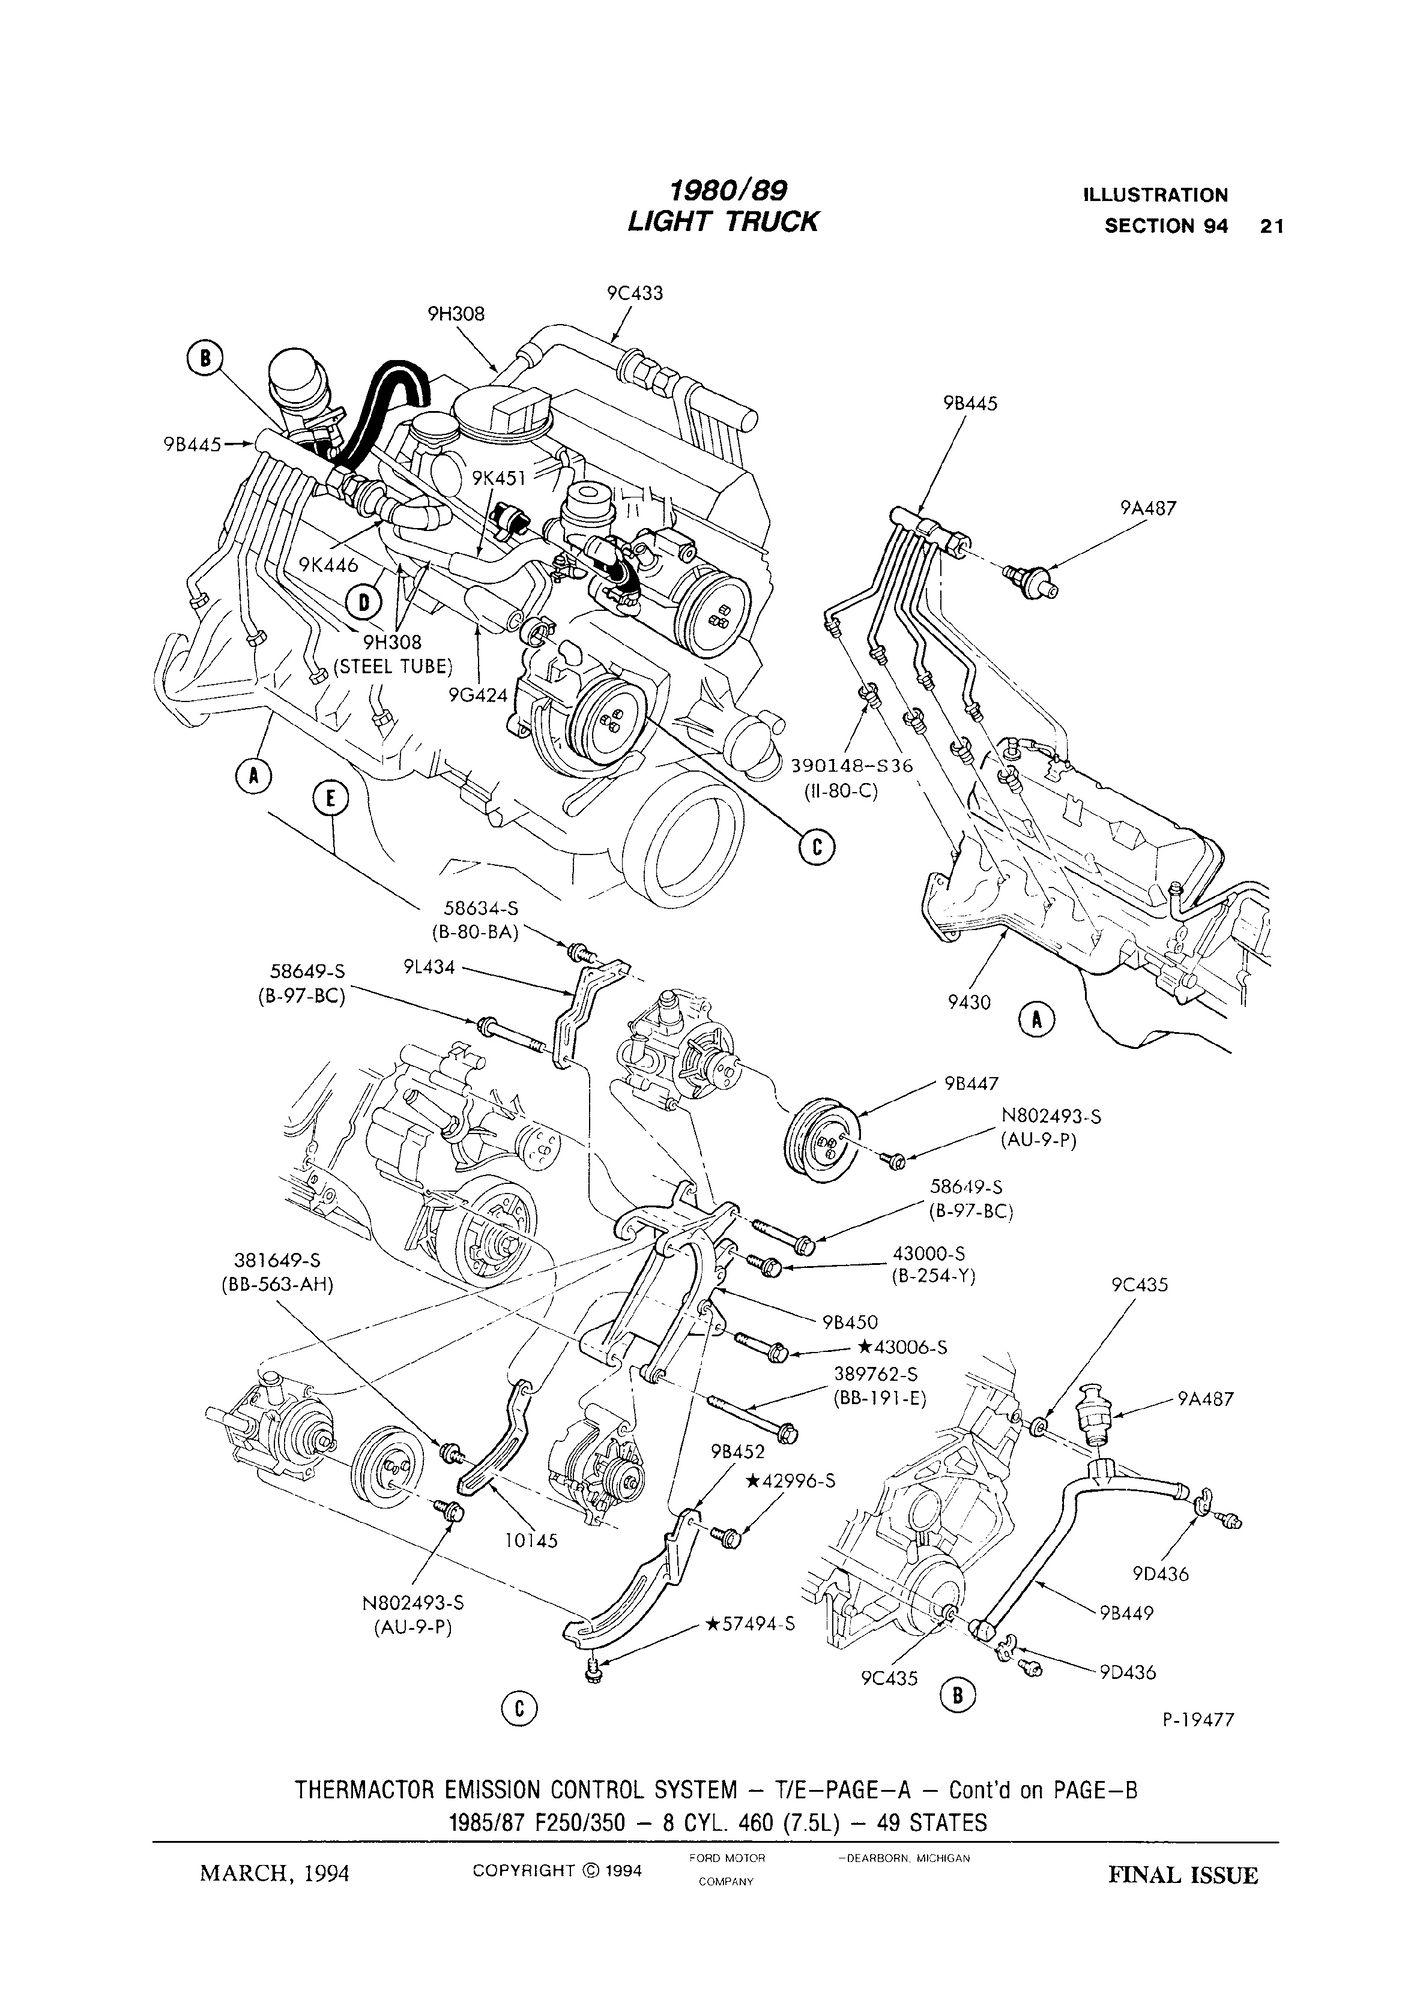 international 254 wiring diagram best wiring library 1980 Camaro Colors wire diagram fot 254 international 254 international tractor 80 smog diagram 336332dfffe8868bcca97a1fa64b076dee8fcba7 wire diagram fot 254 motor